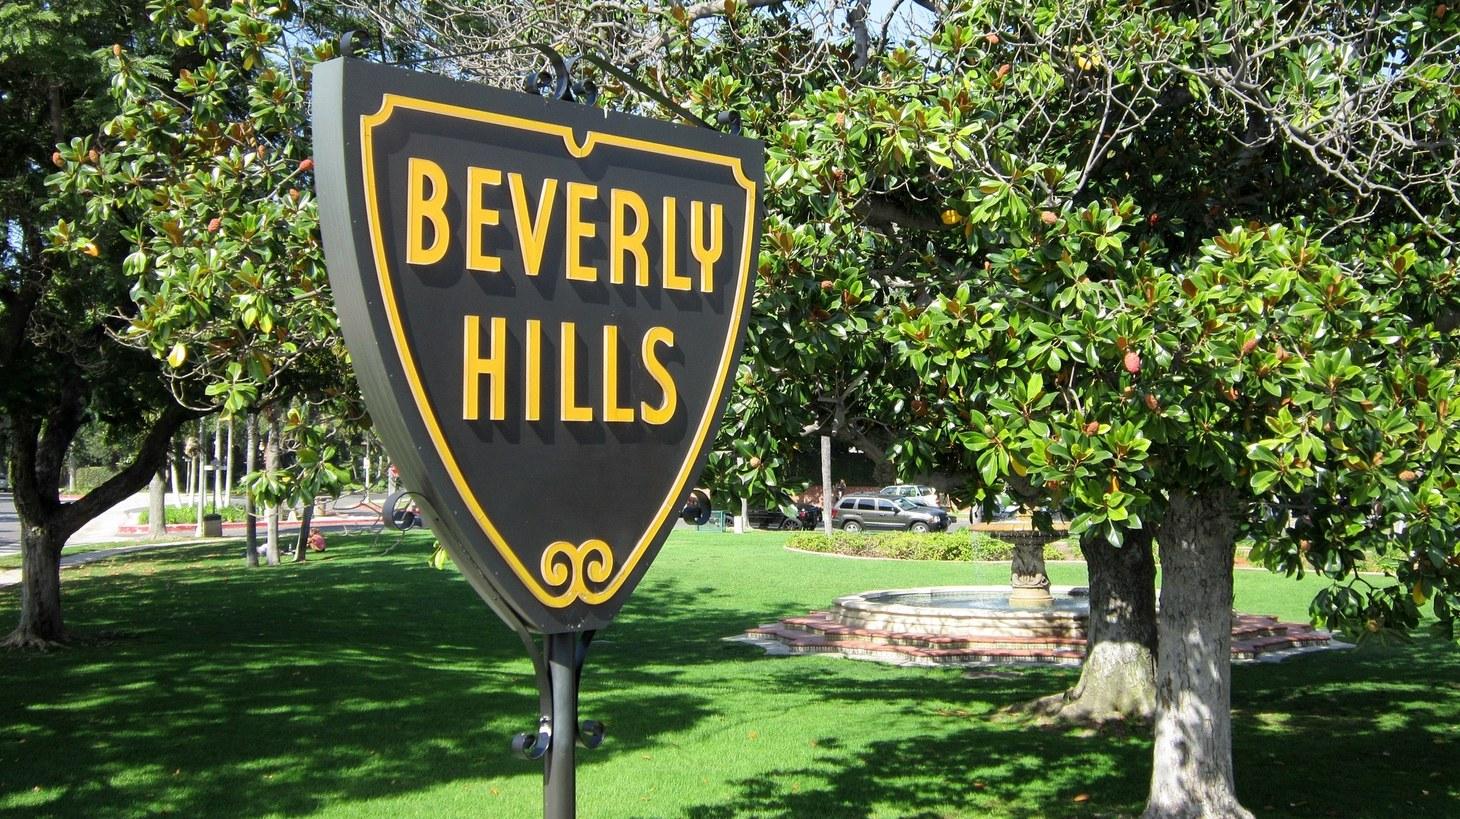 Beverly Hills.